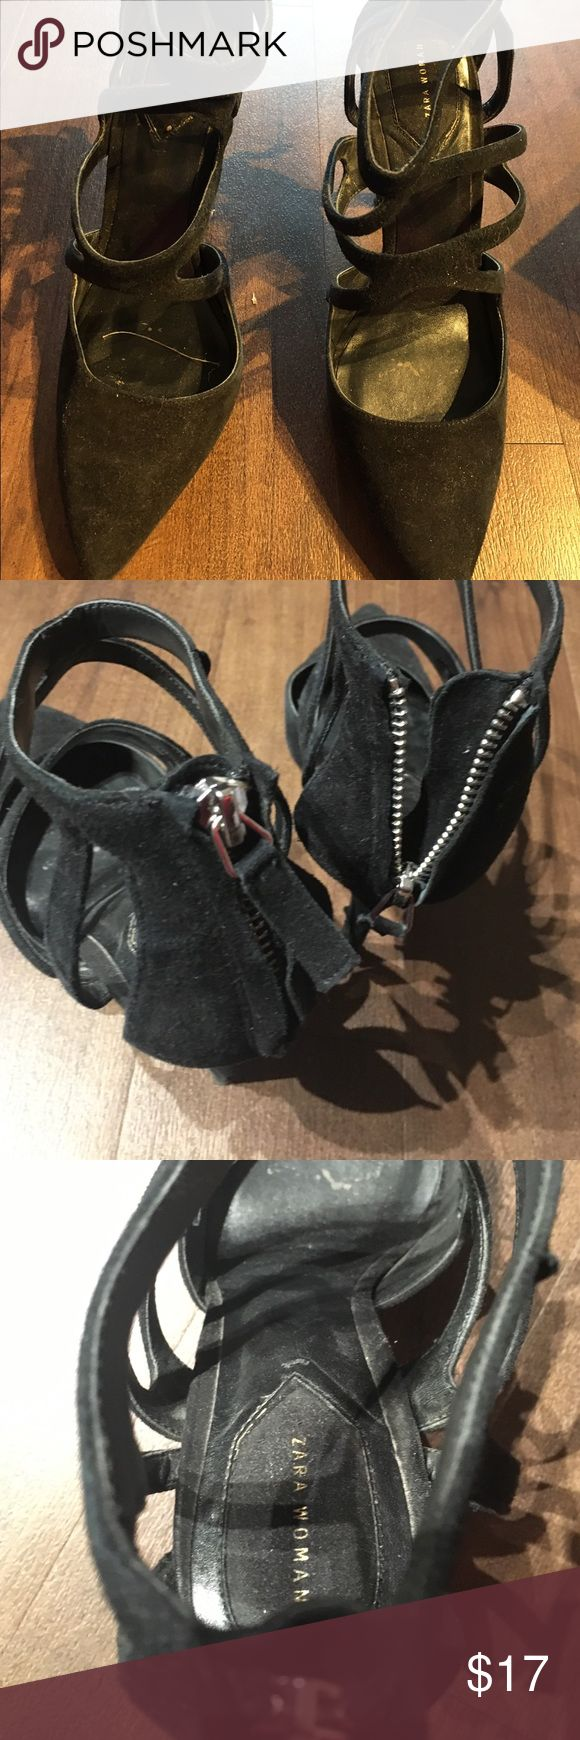 Zara woman black strapping heels Zara woman heels. Black and strappy with black zipper. Good condition. Zara Shoes Heels